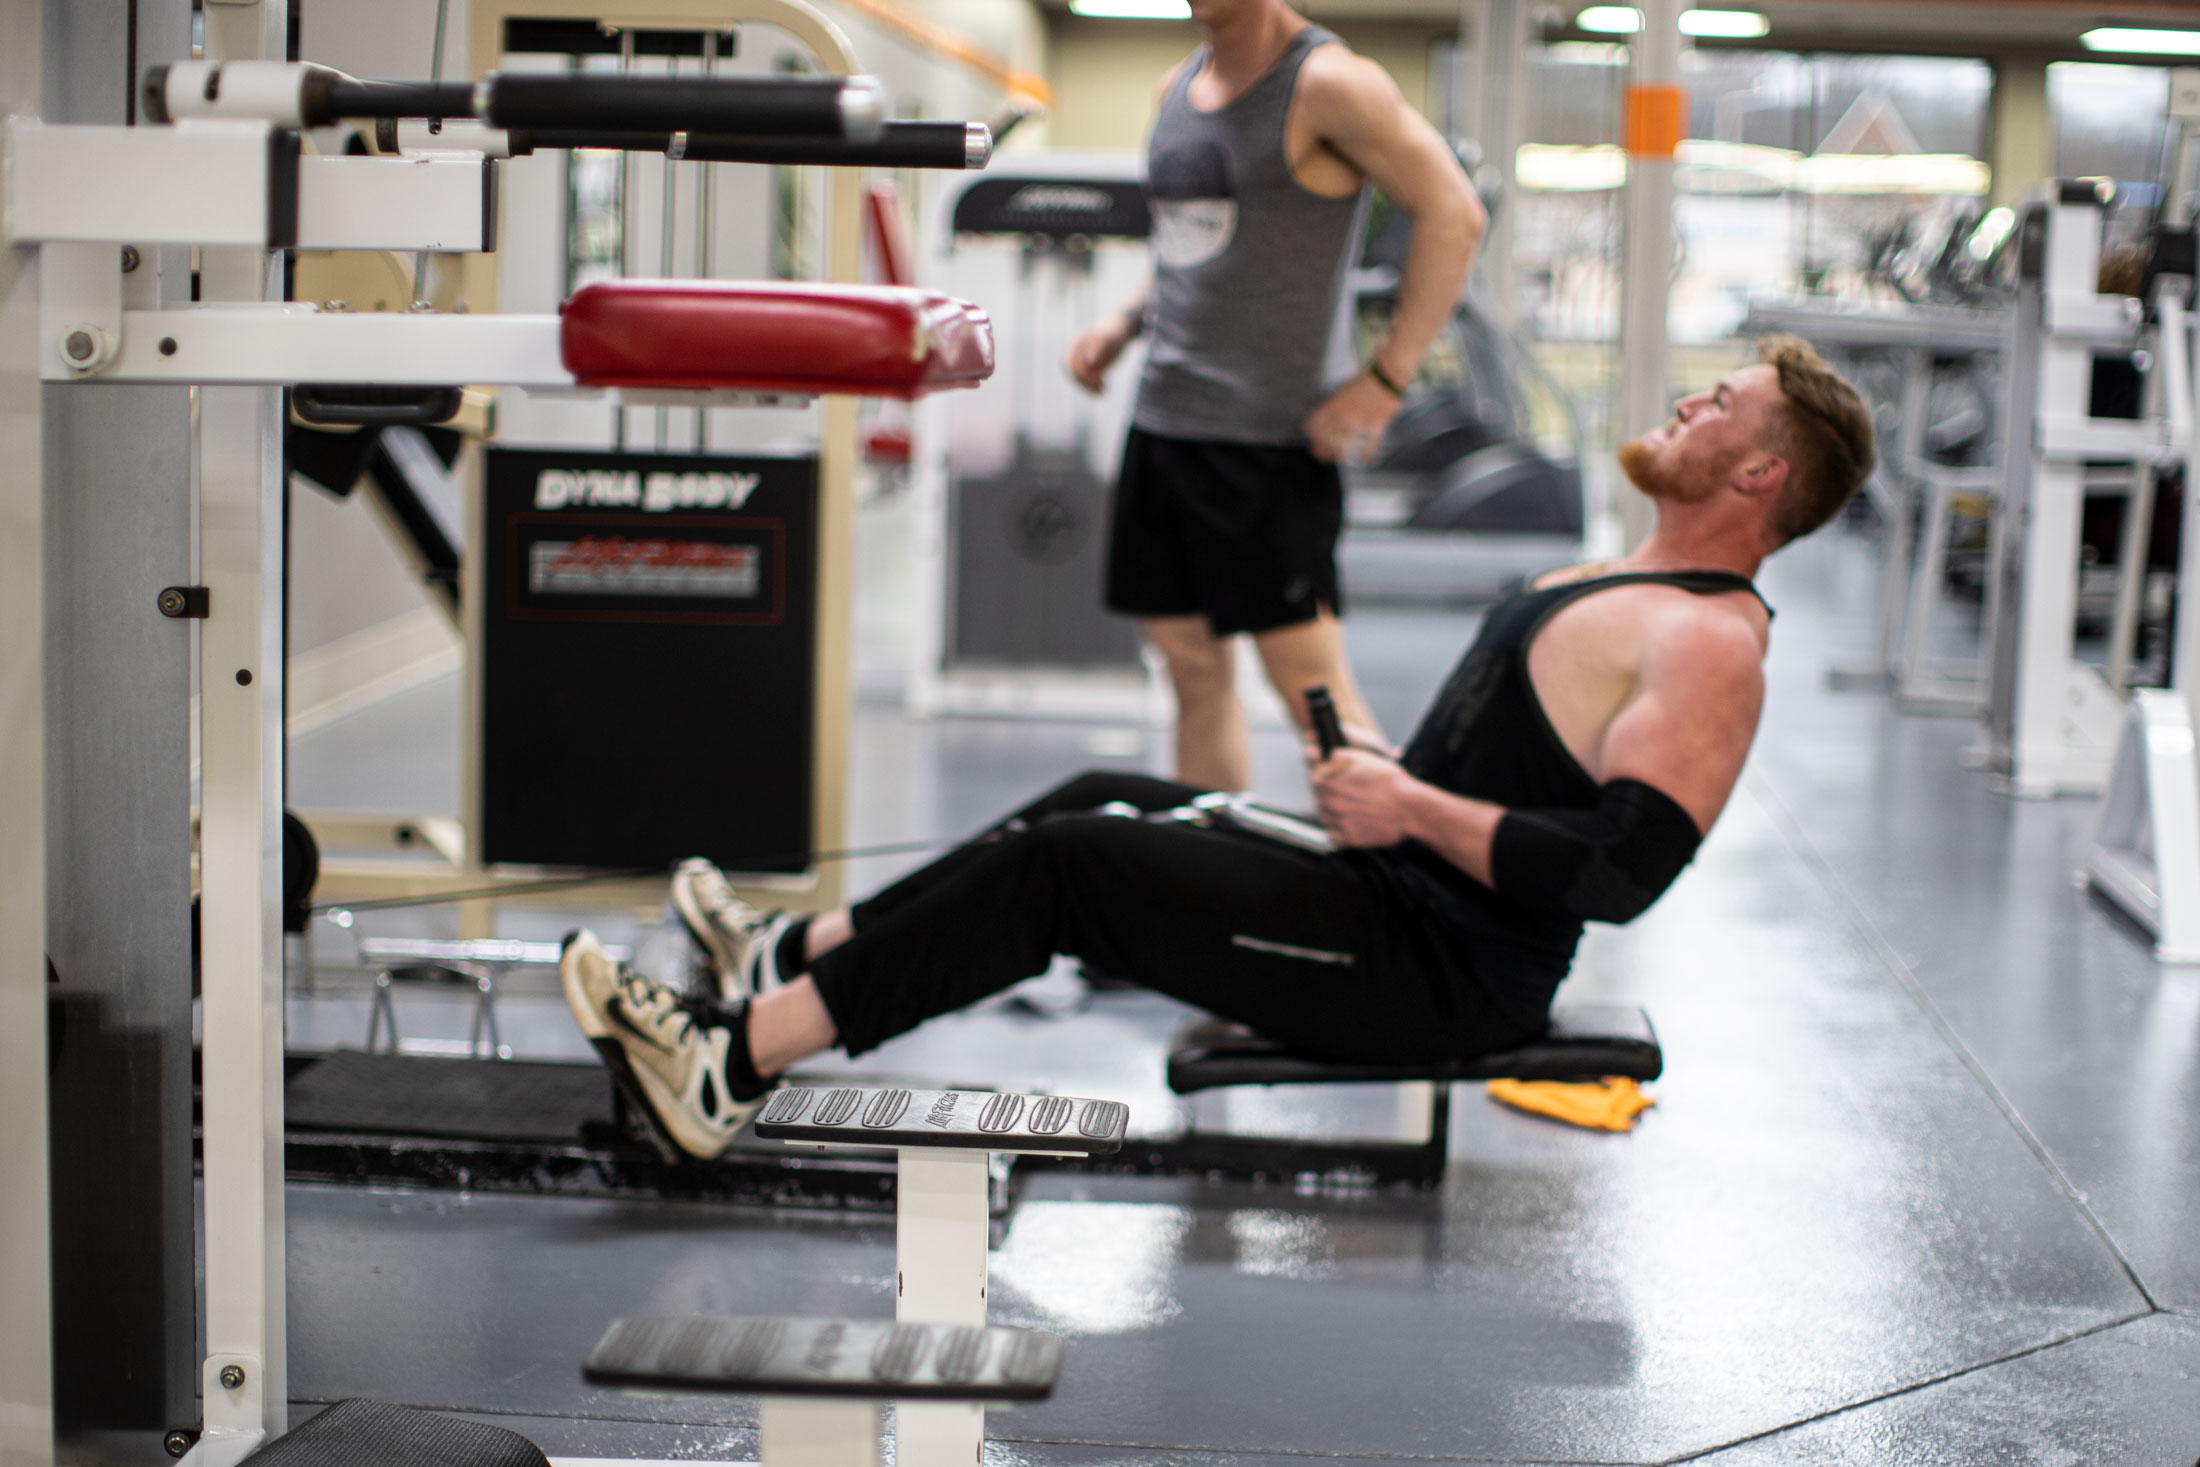 image of man in black tank top using exercise machine